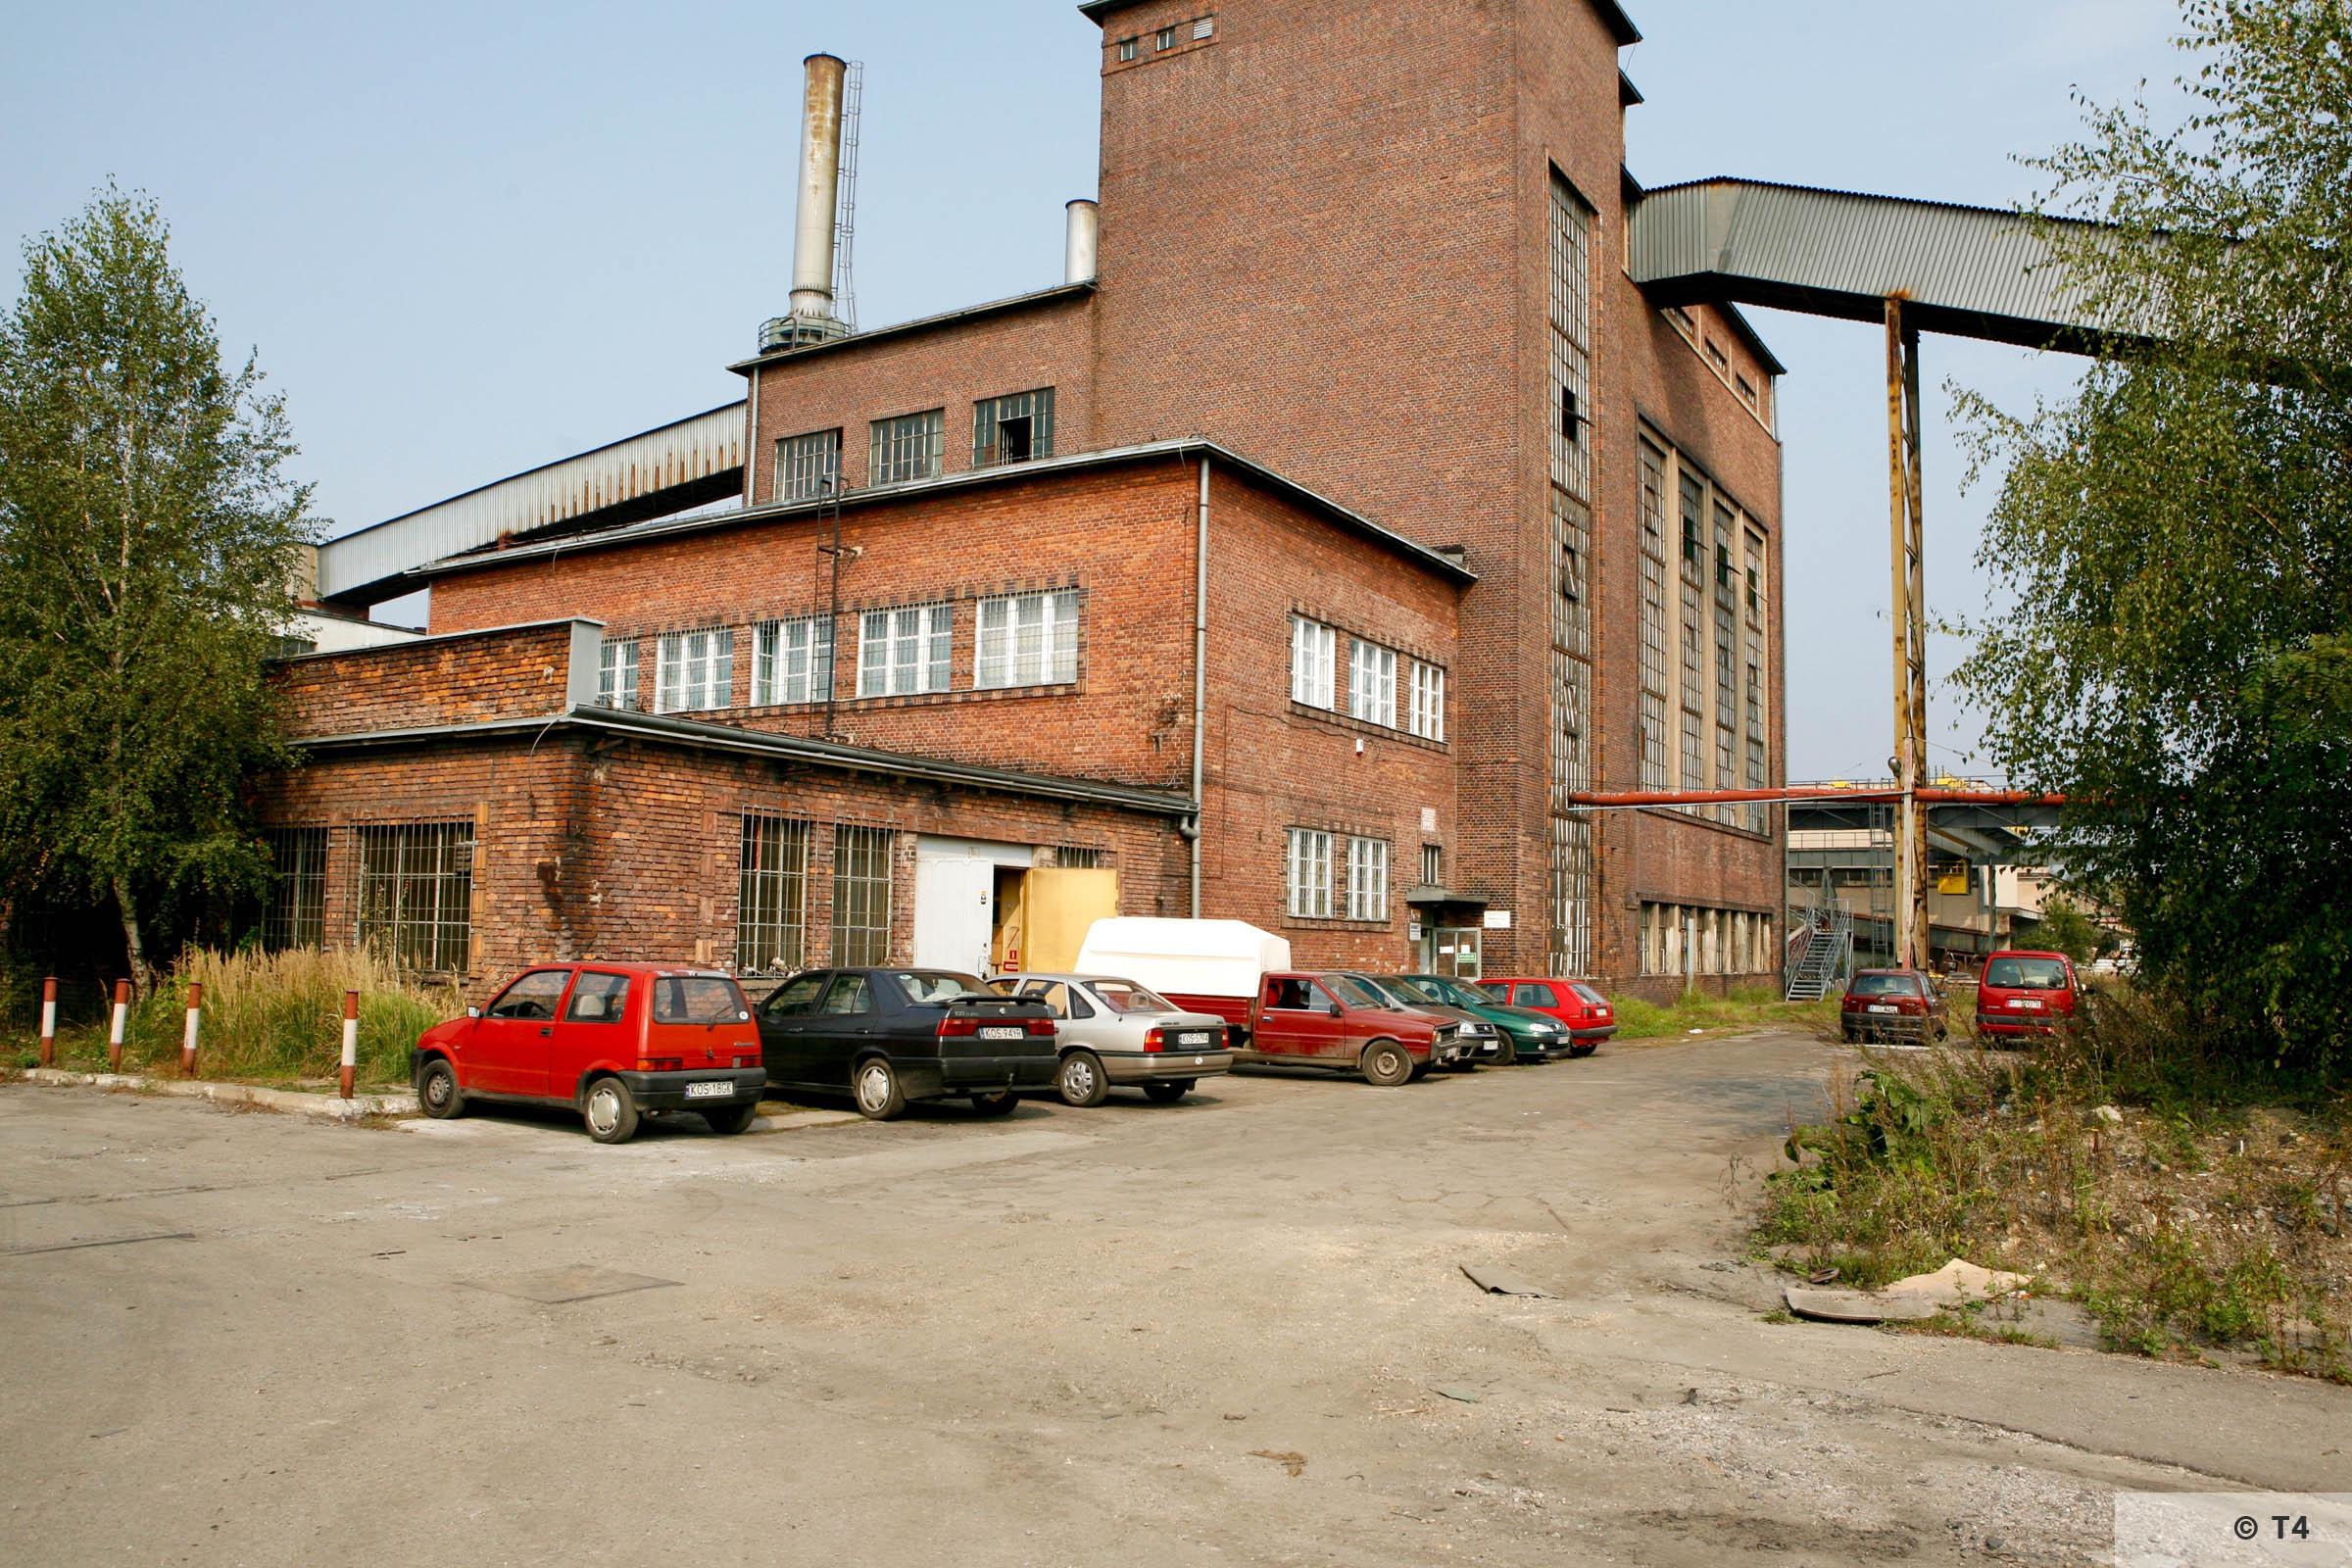 Bata factory. 2006 T4 1634